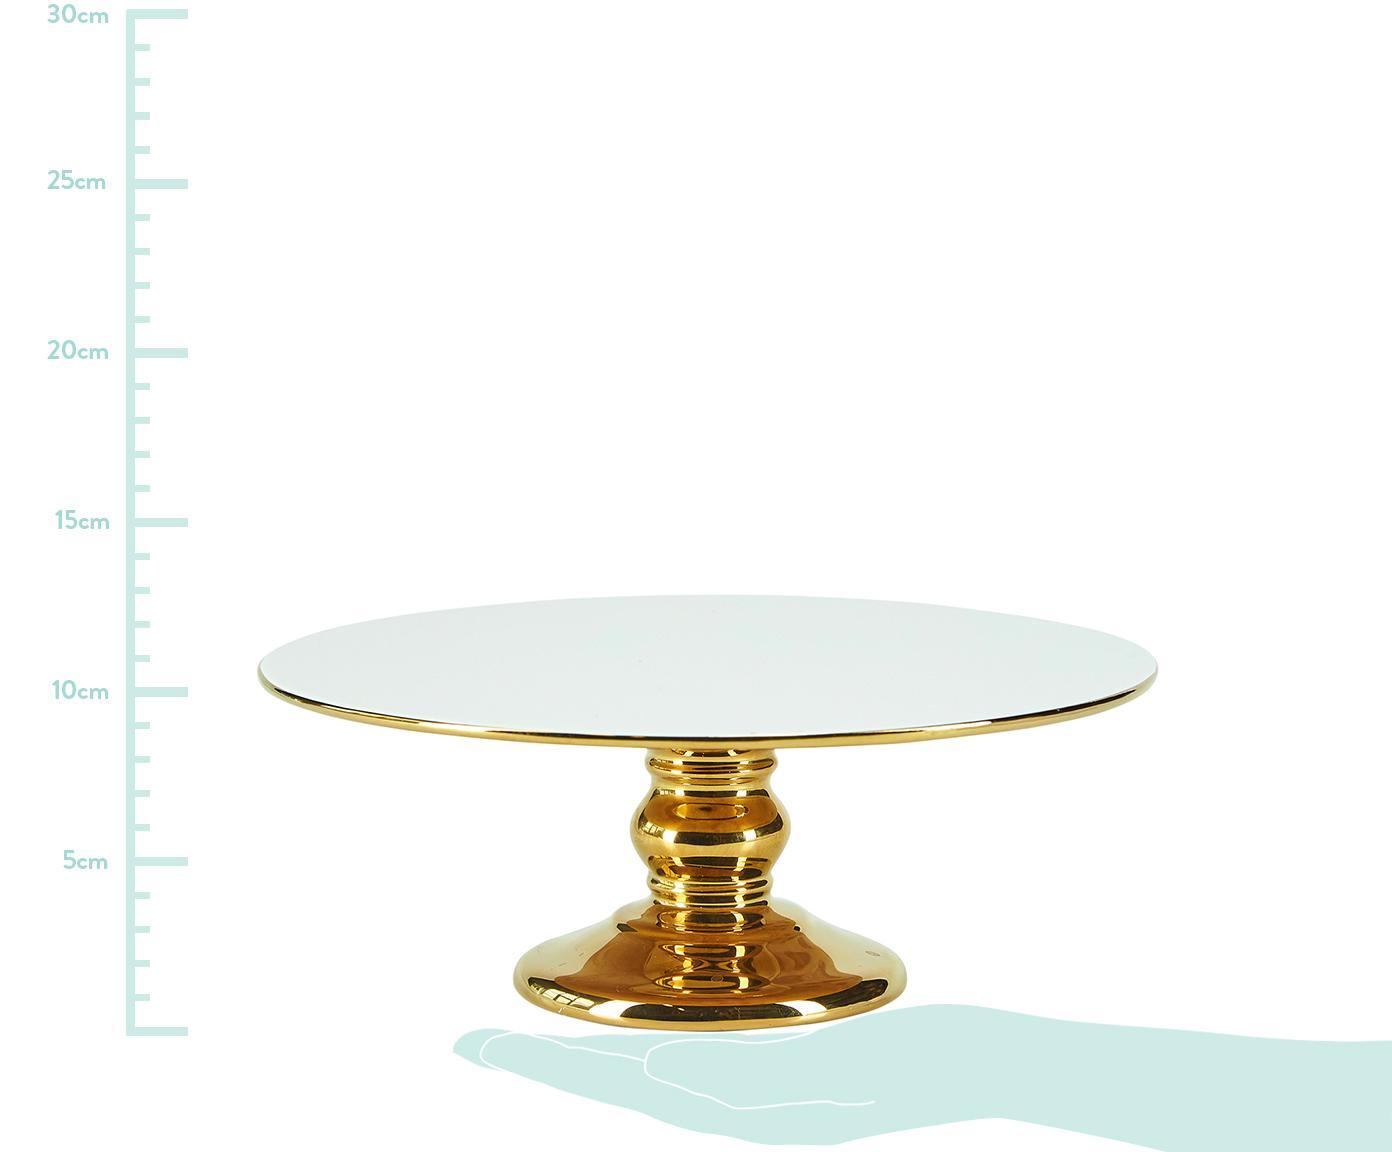 Taartplateau Tarta, Keramiek, Wit, goudkleurig, Ø 26 x H 10 cm